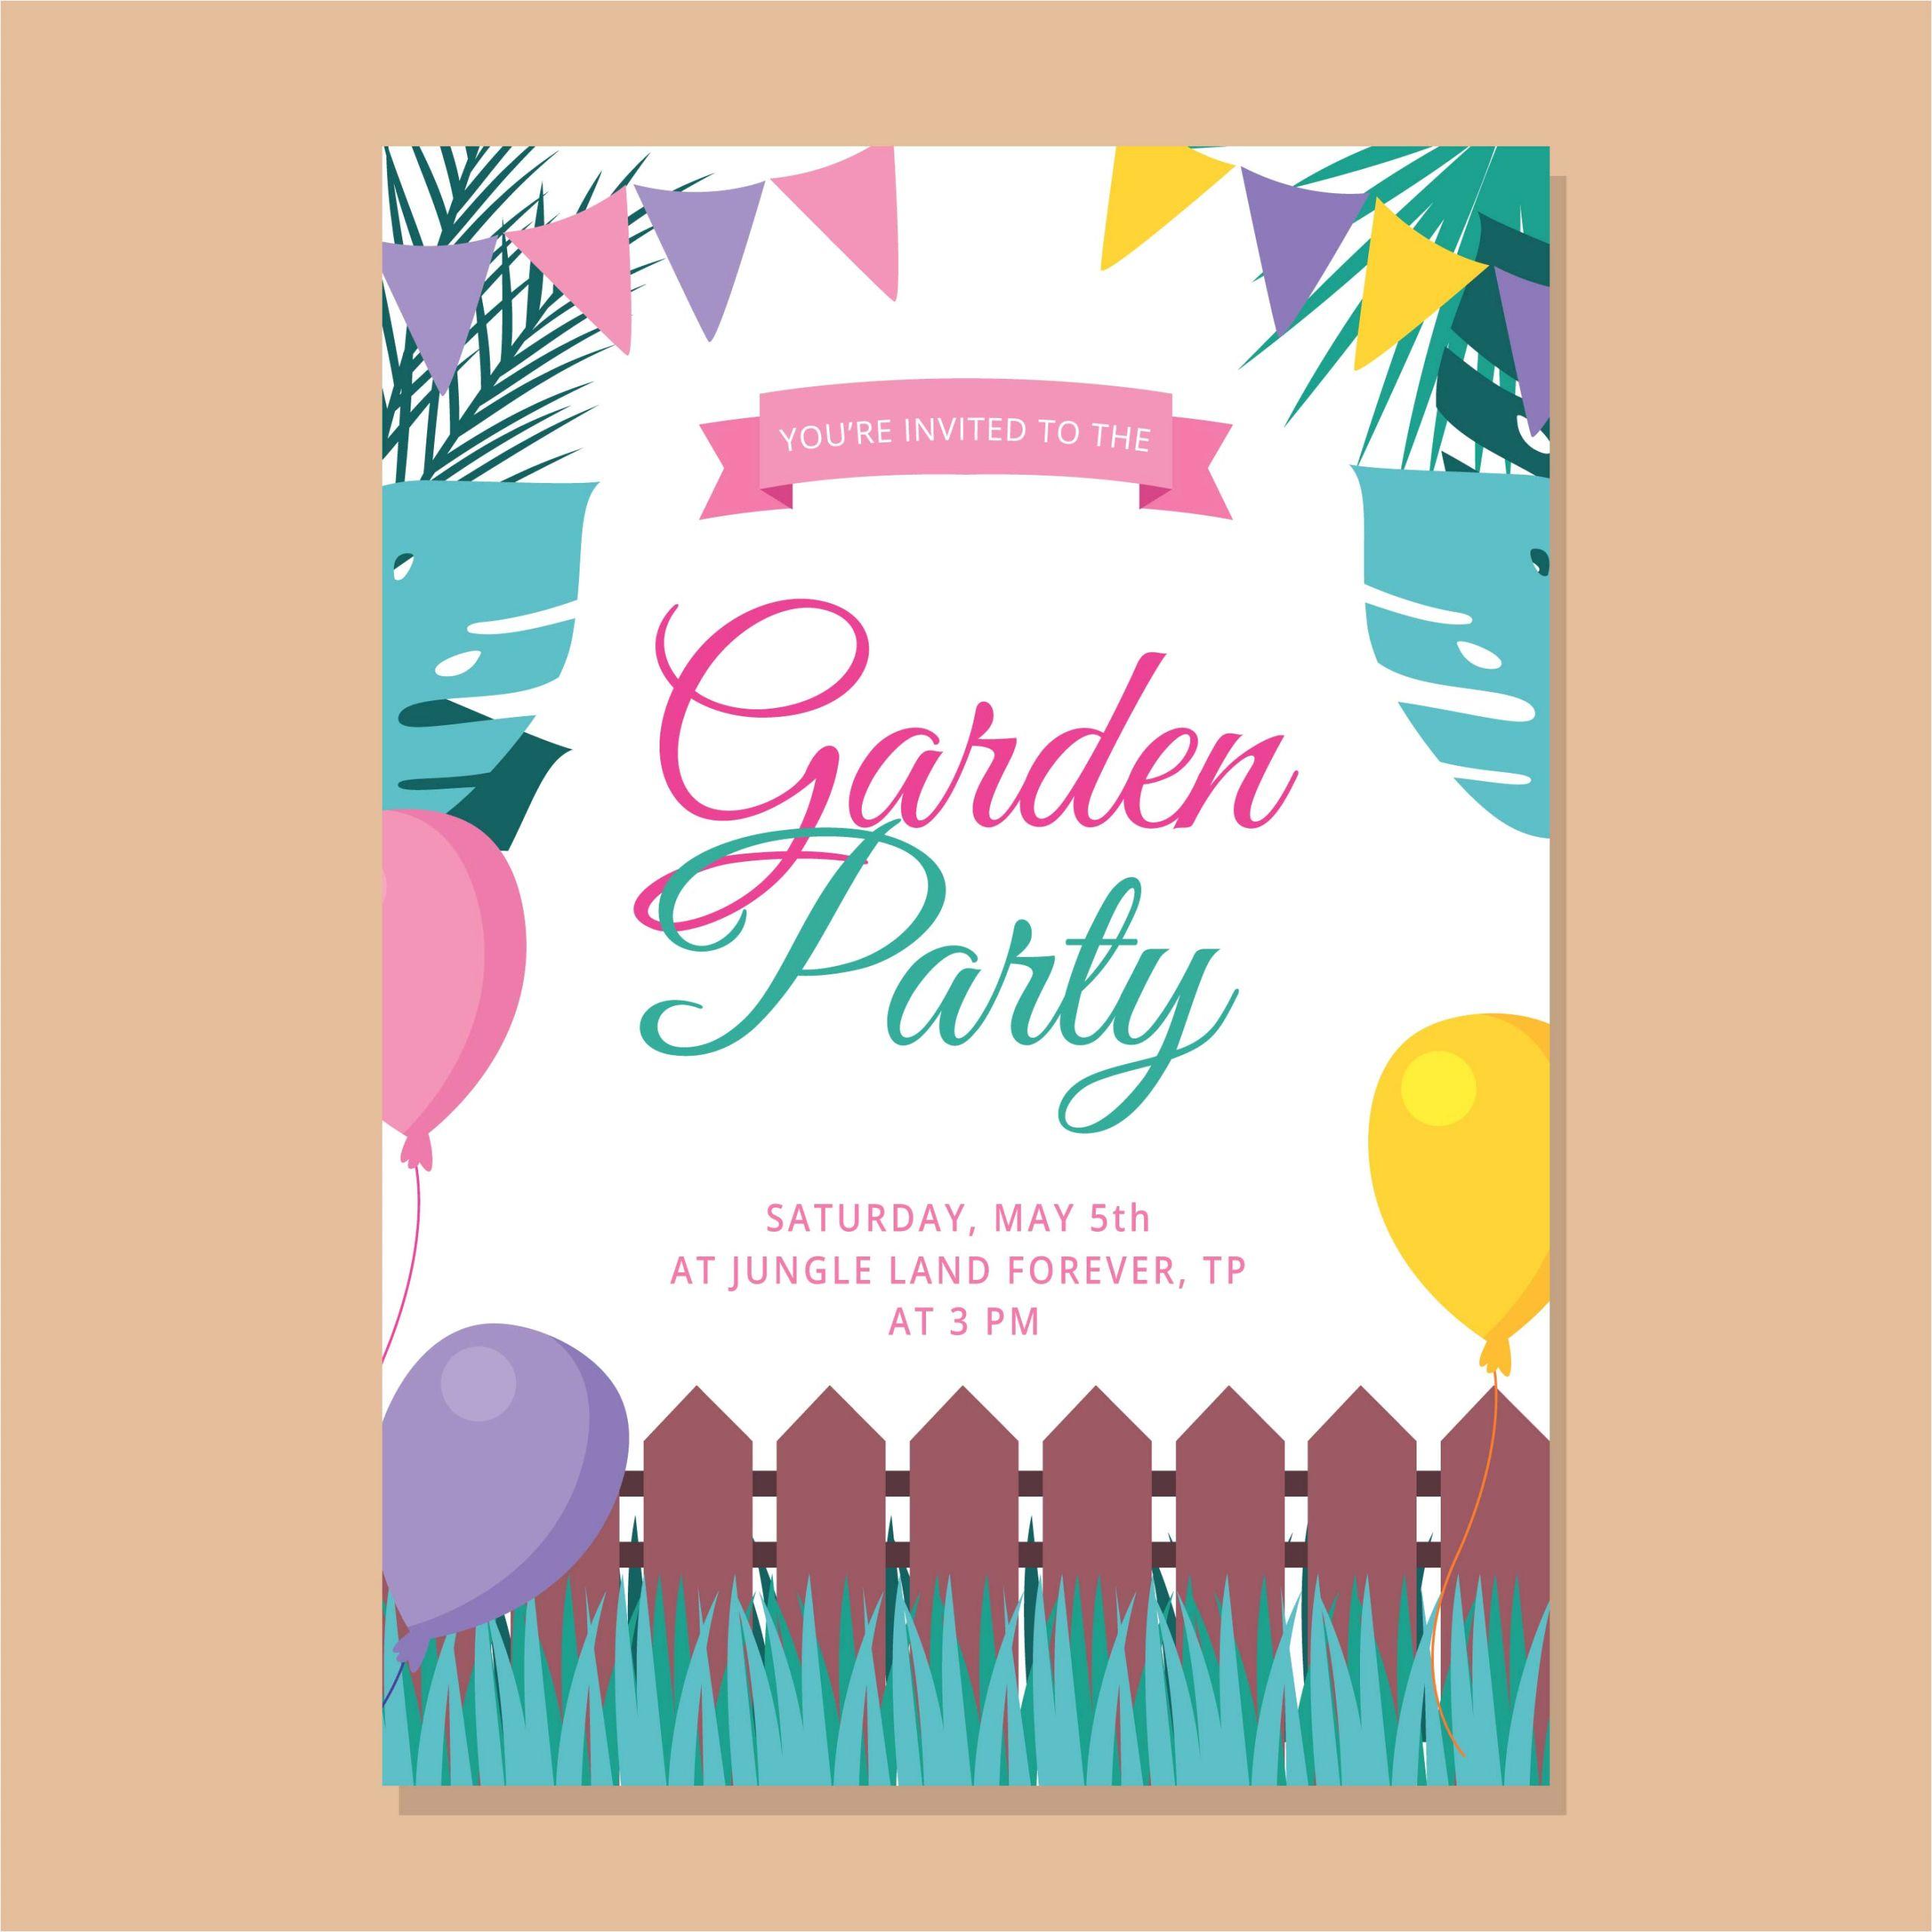 217621 garden party invitation